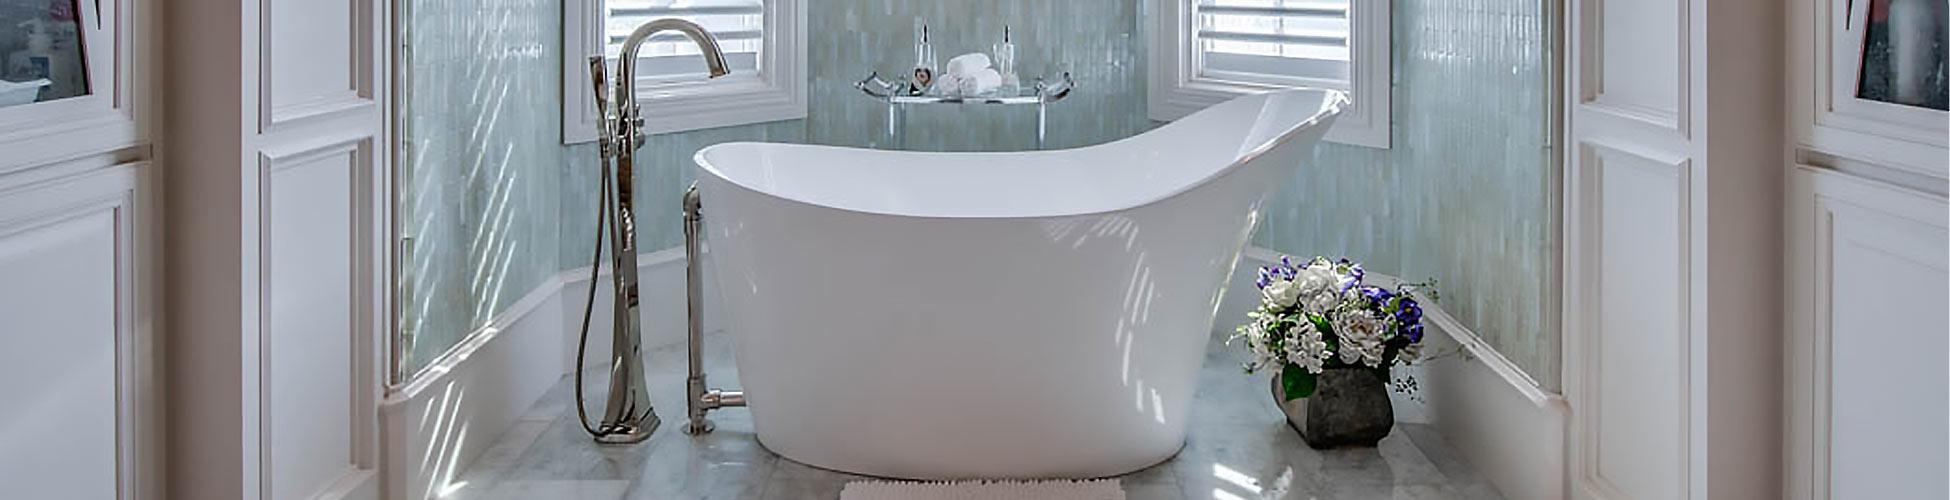 custom-bathroom-with-tub.jpg